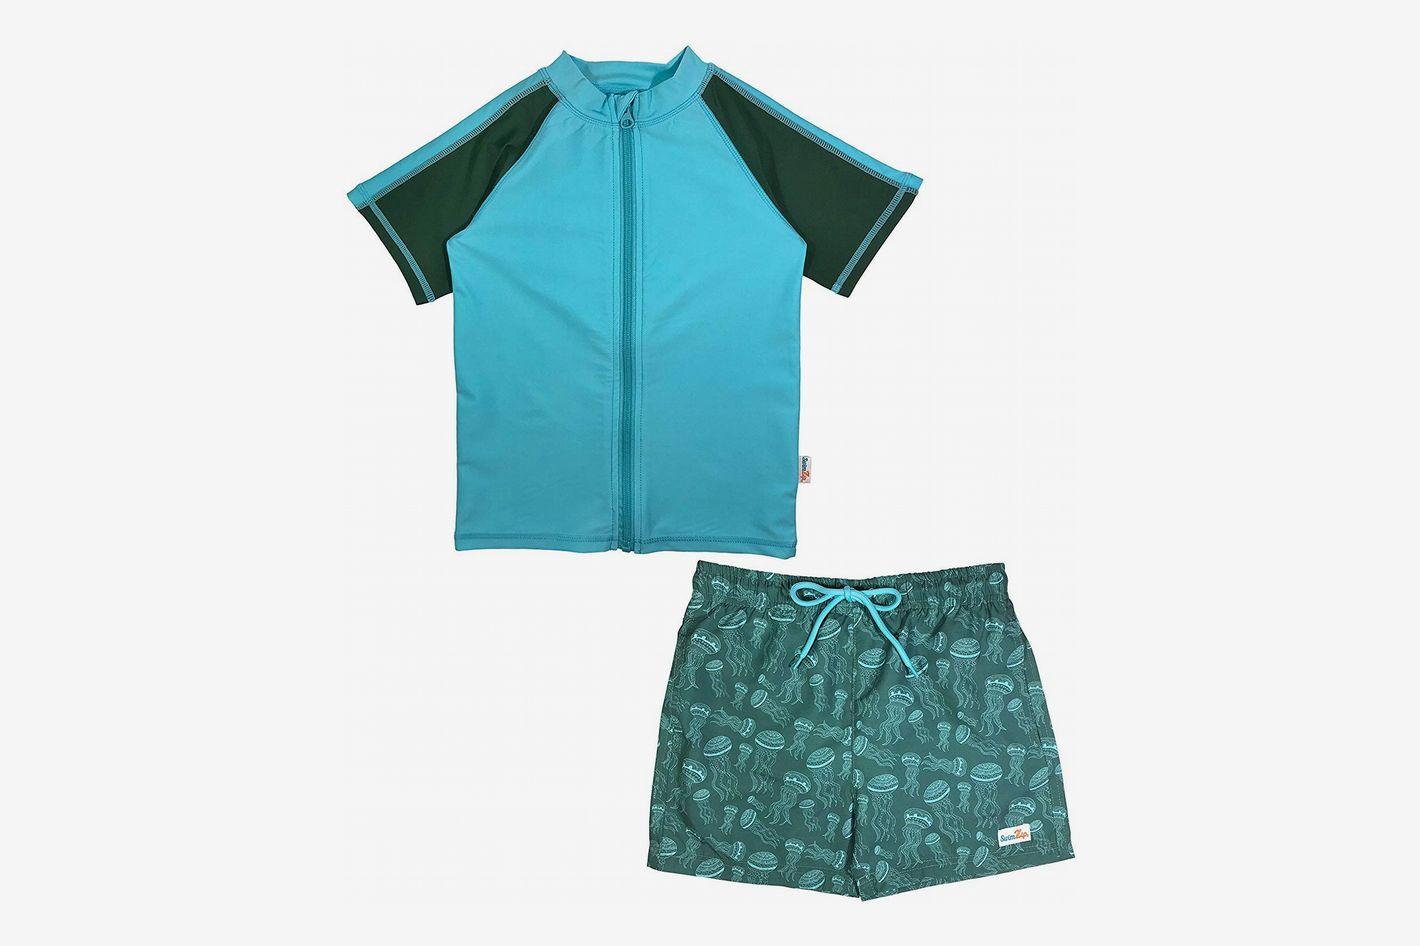 SwimZip Boys UPF 50+ Short Sleeve Rash Guard Swim Trunk Set